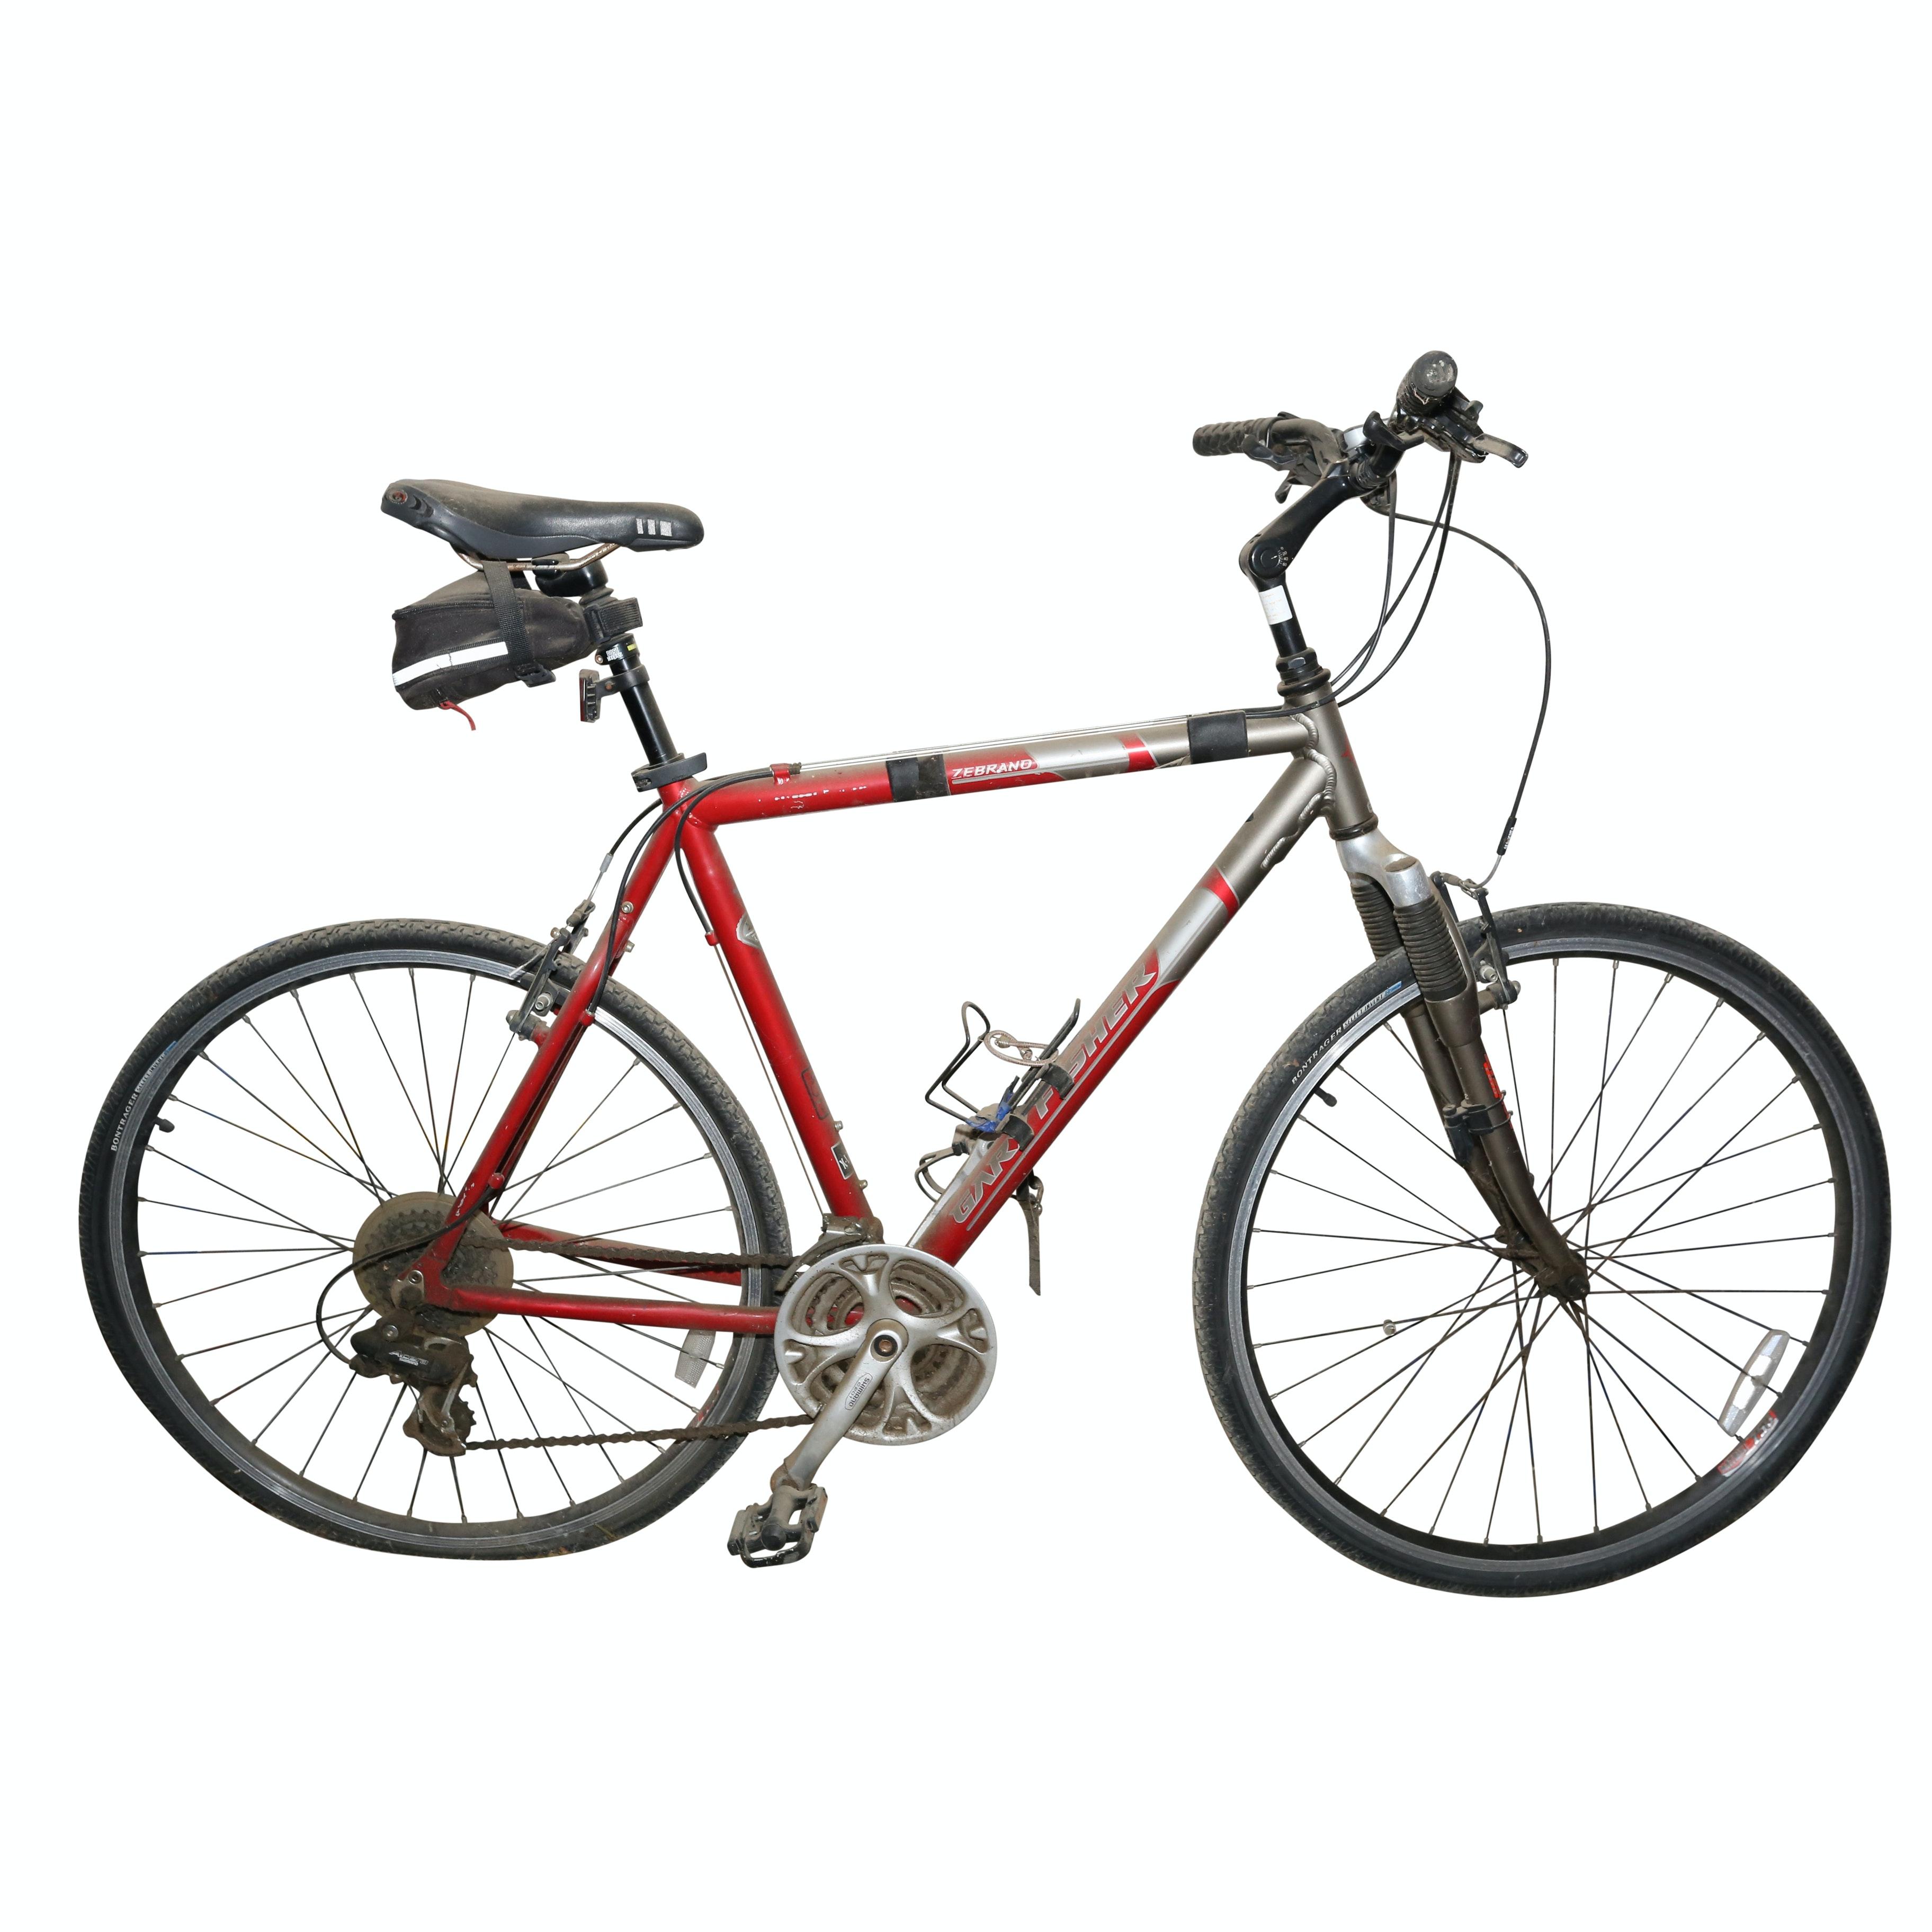 Gary Fisher Zebrano Hybrid Bicycle